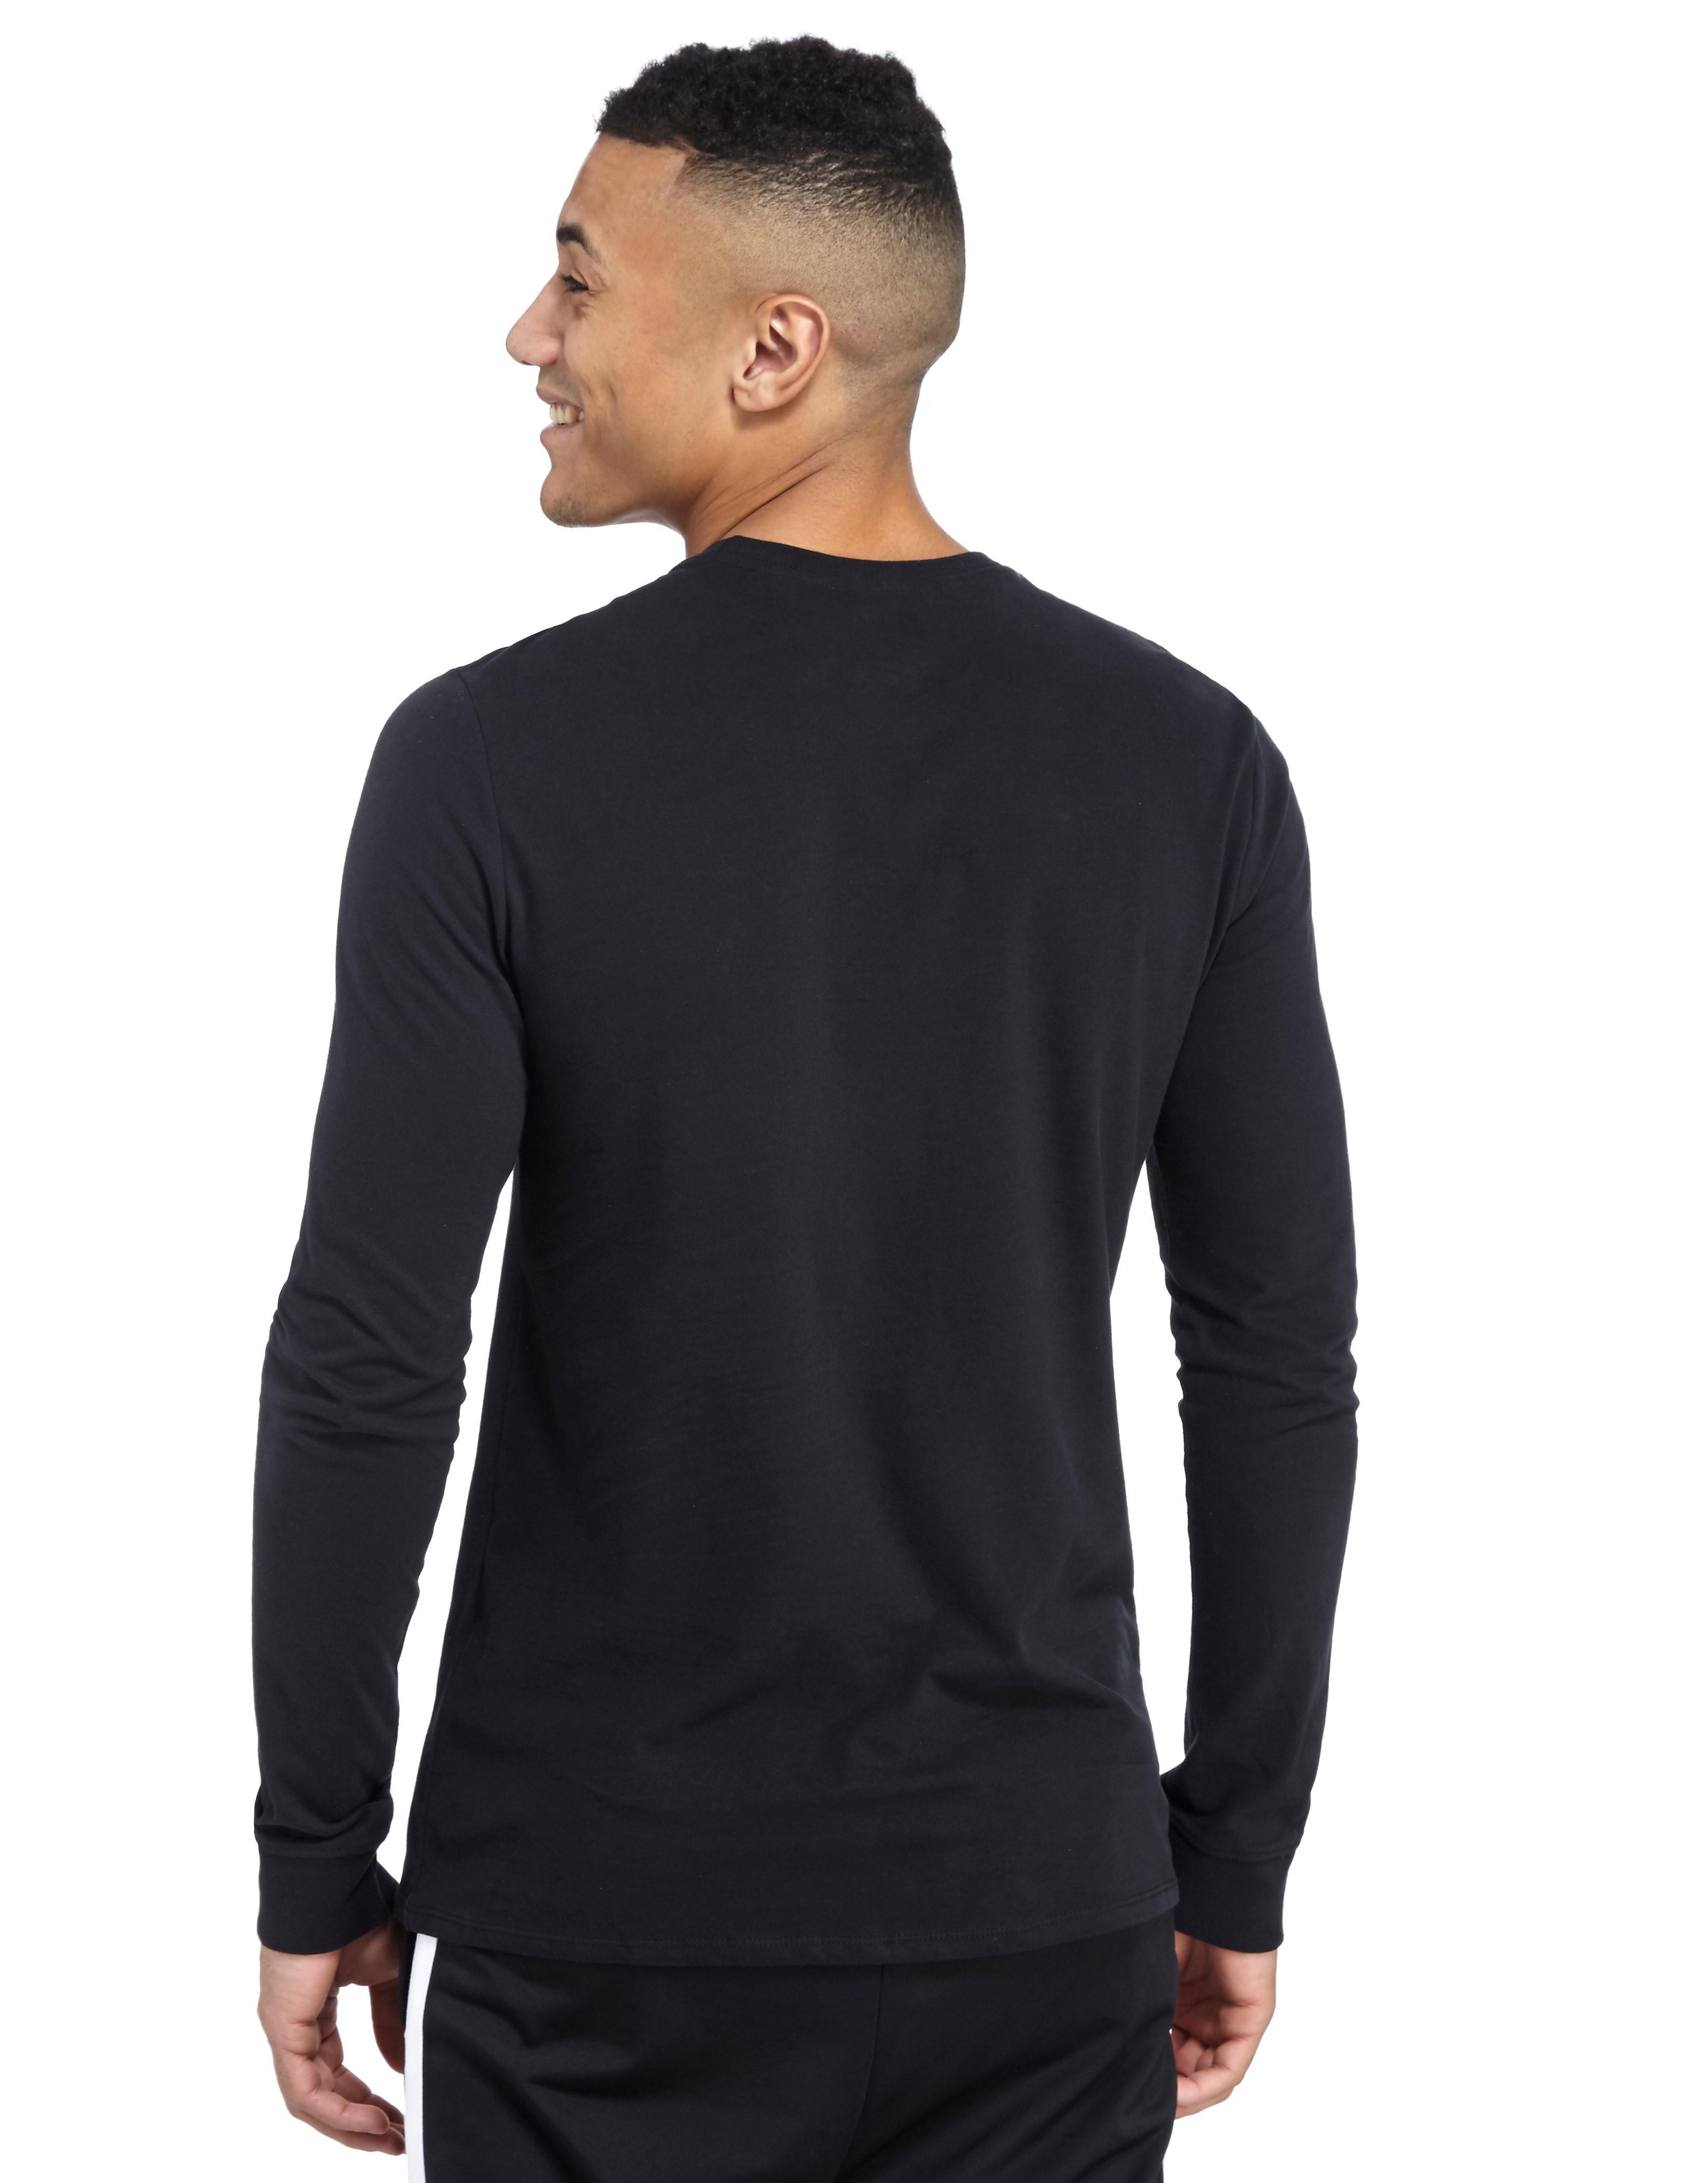 Nike Futura Icon Longsleeve T-Shirt